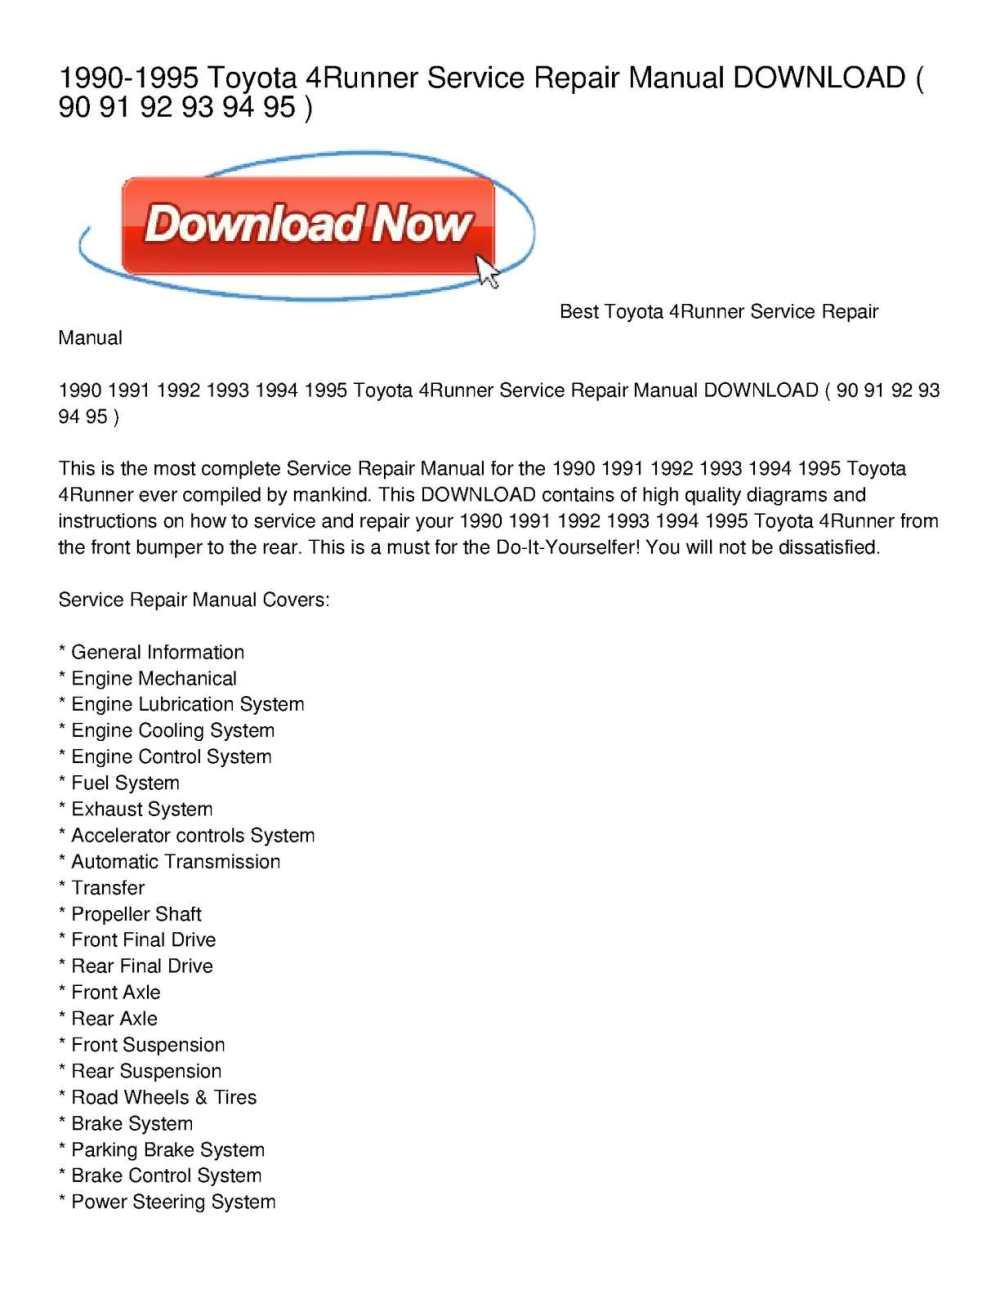 medium resolution of 1995 toyota 4runner window wiring diagram